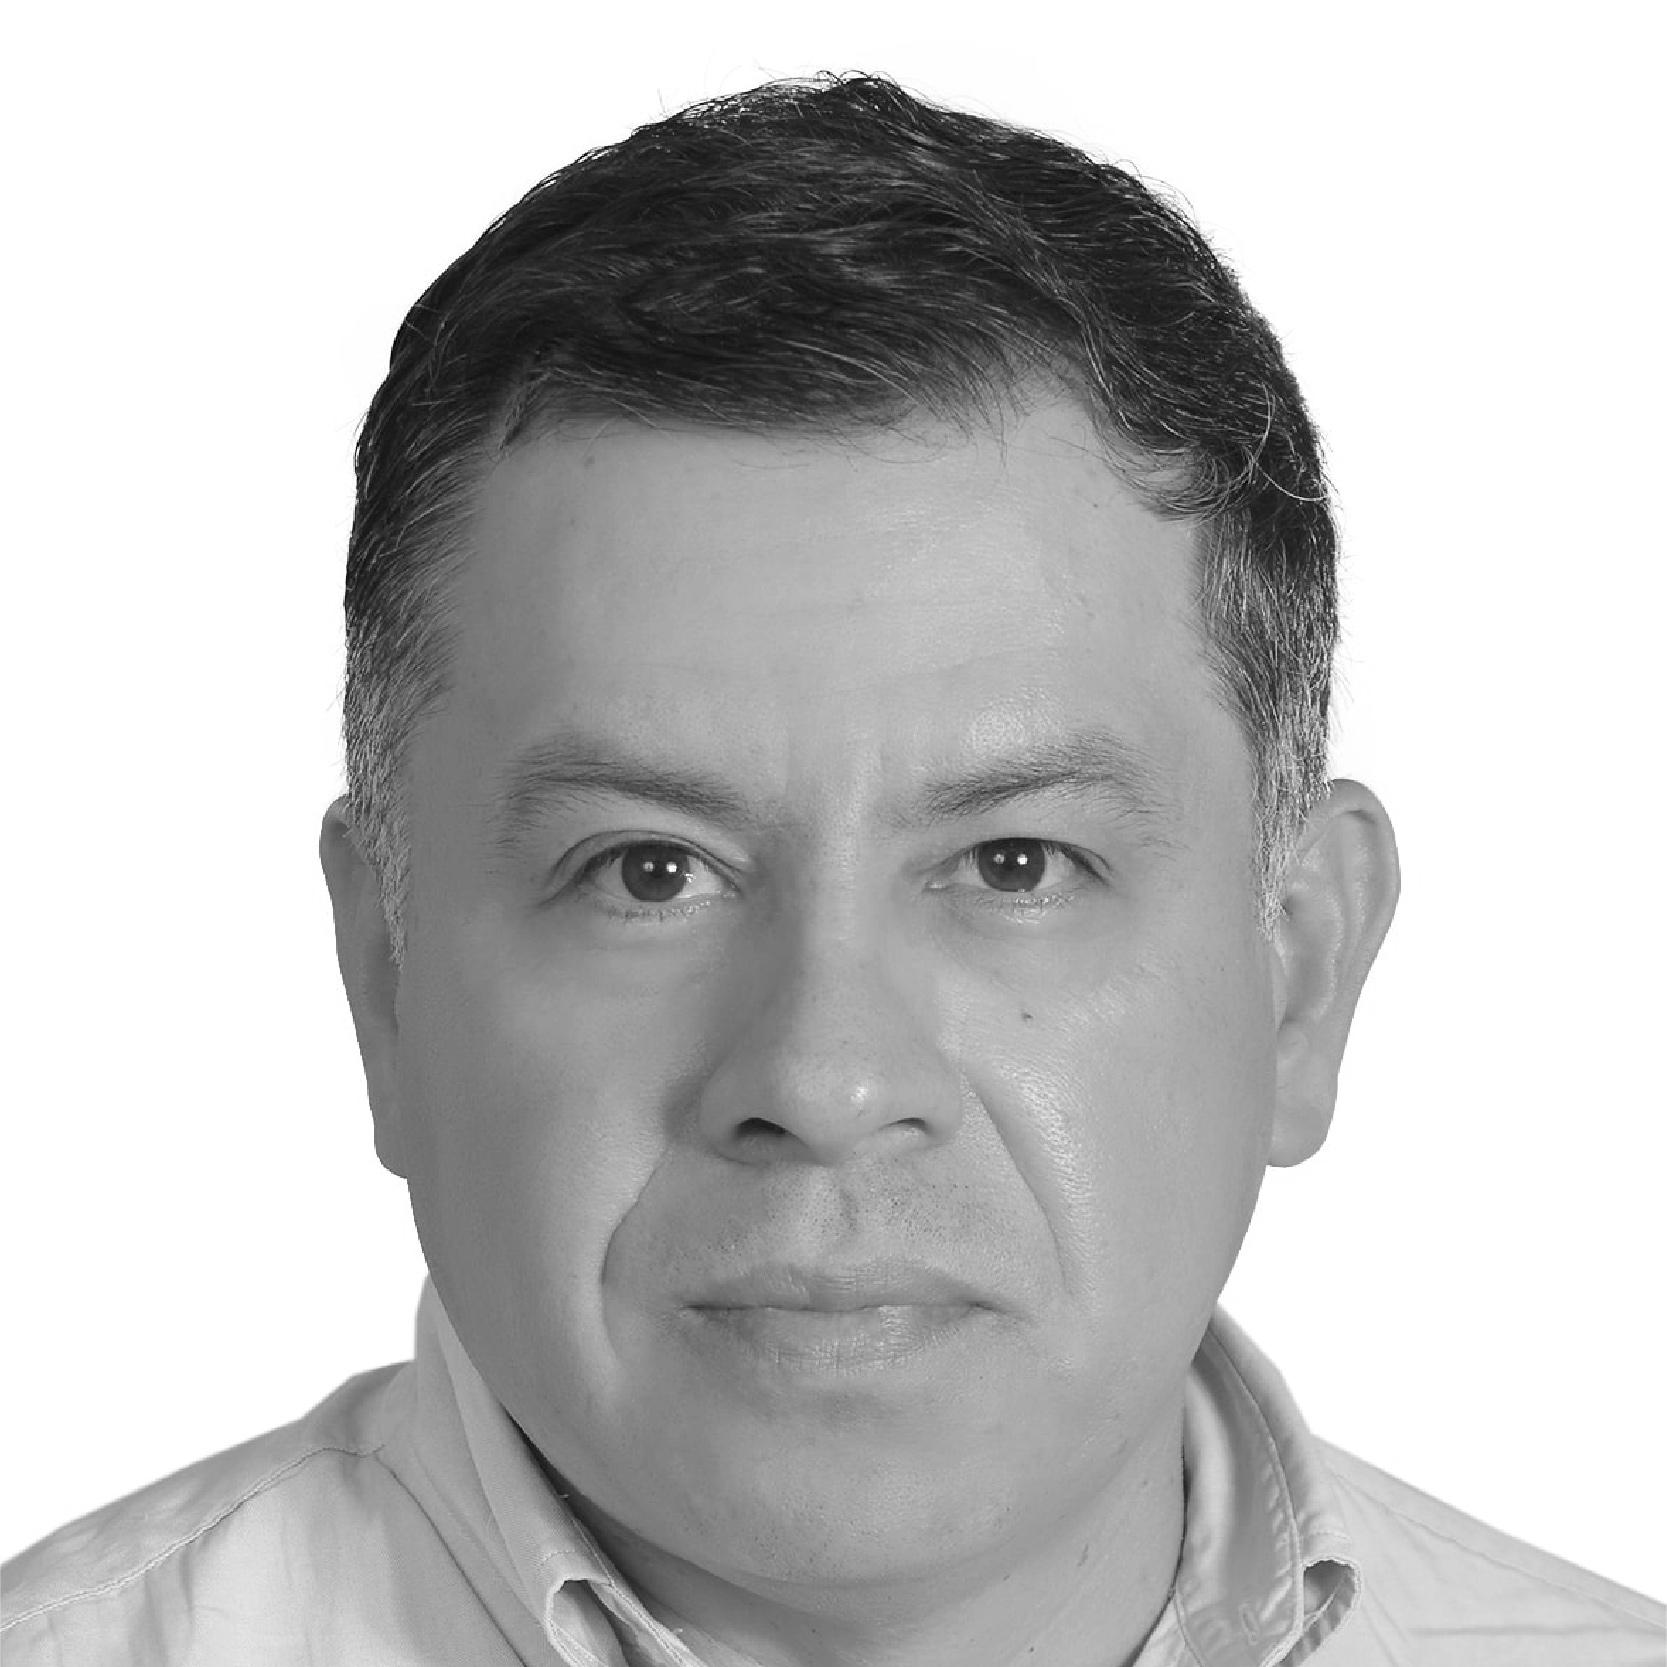 Eduardo Geovanny Espinoza Gálvez